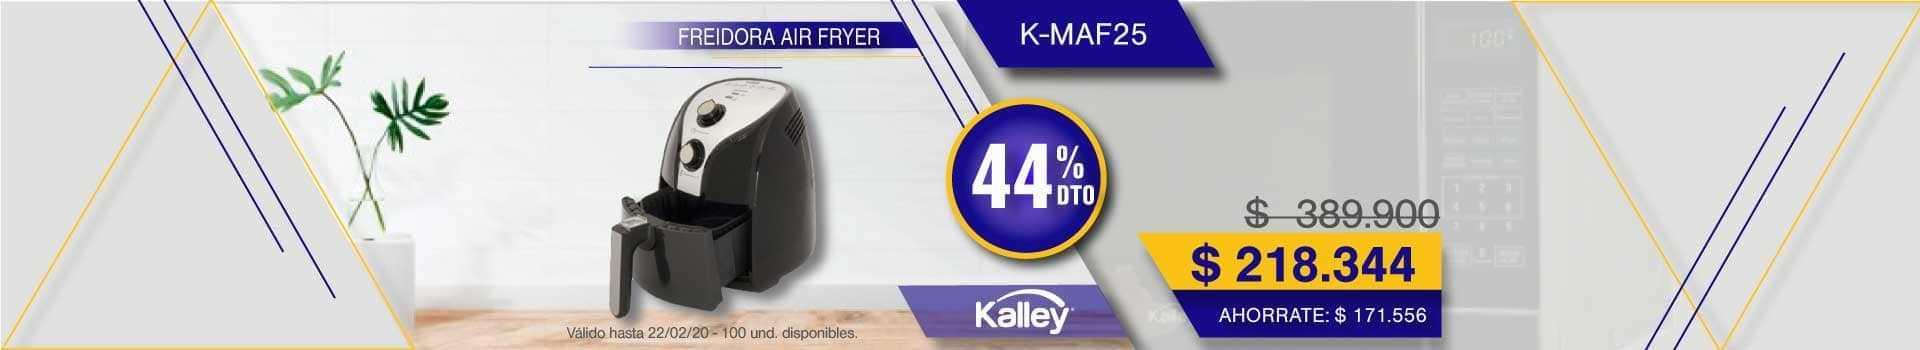 AK-KT-MENORES-BCAT-KALLEY-FRYER-FEB15